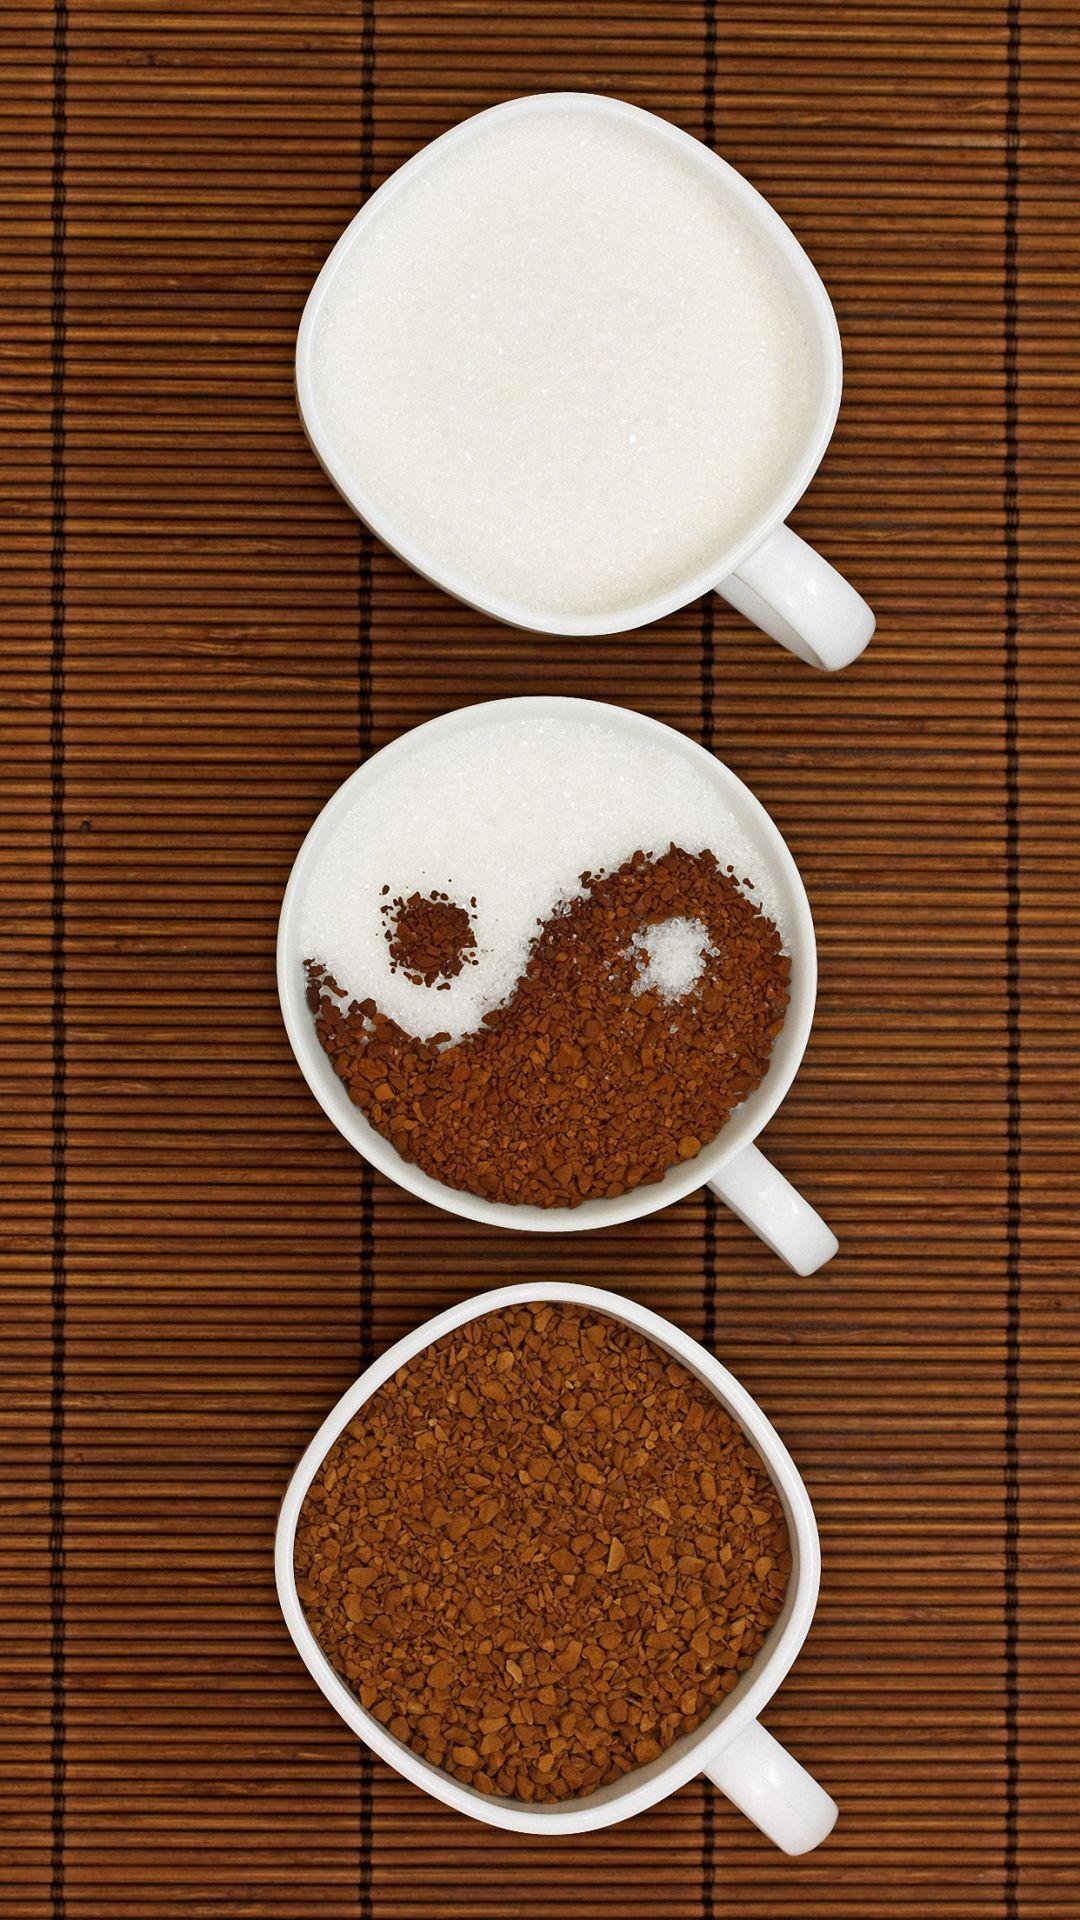 HD cute yin yang coffee iPhone 6 / 6s / Plus wallpapers, cute mobile backgrounds